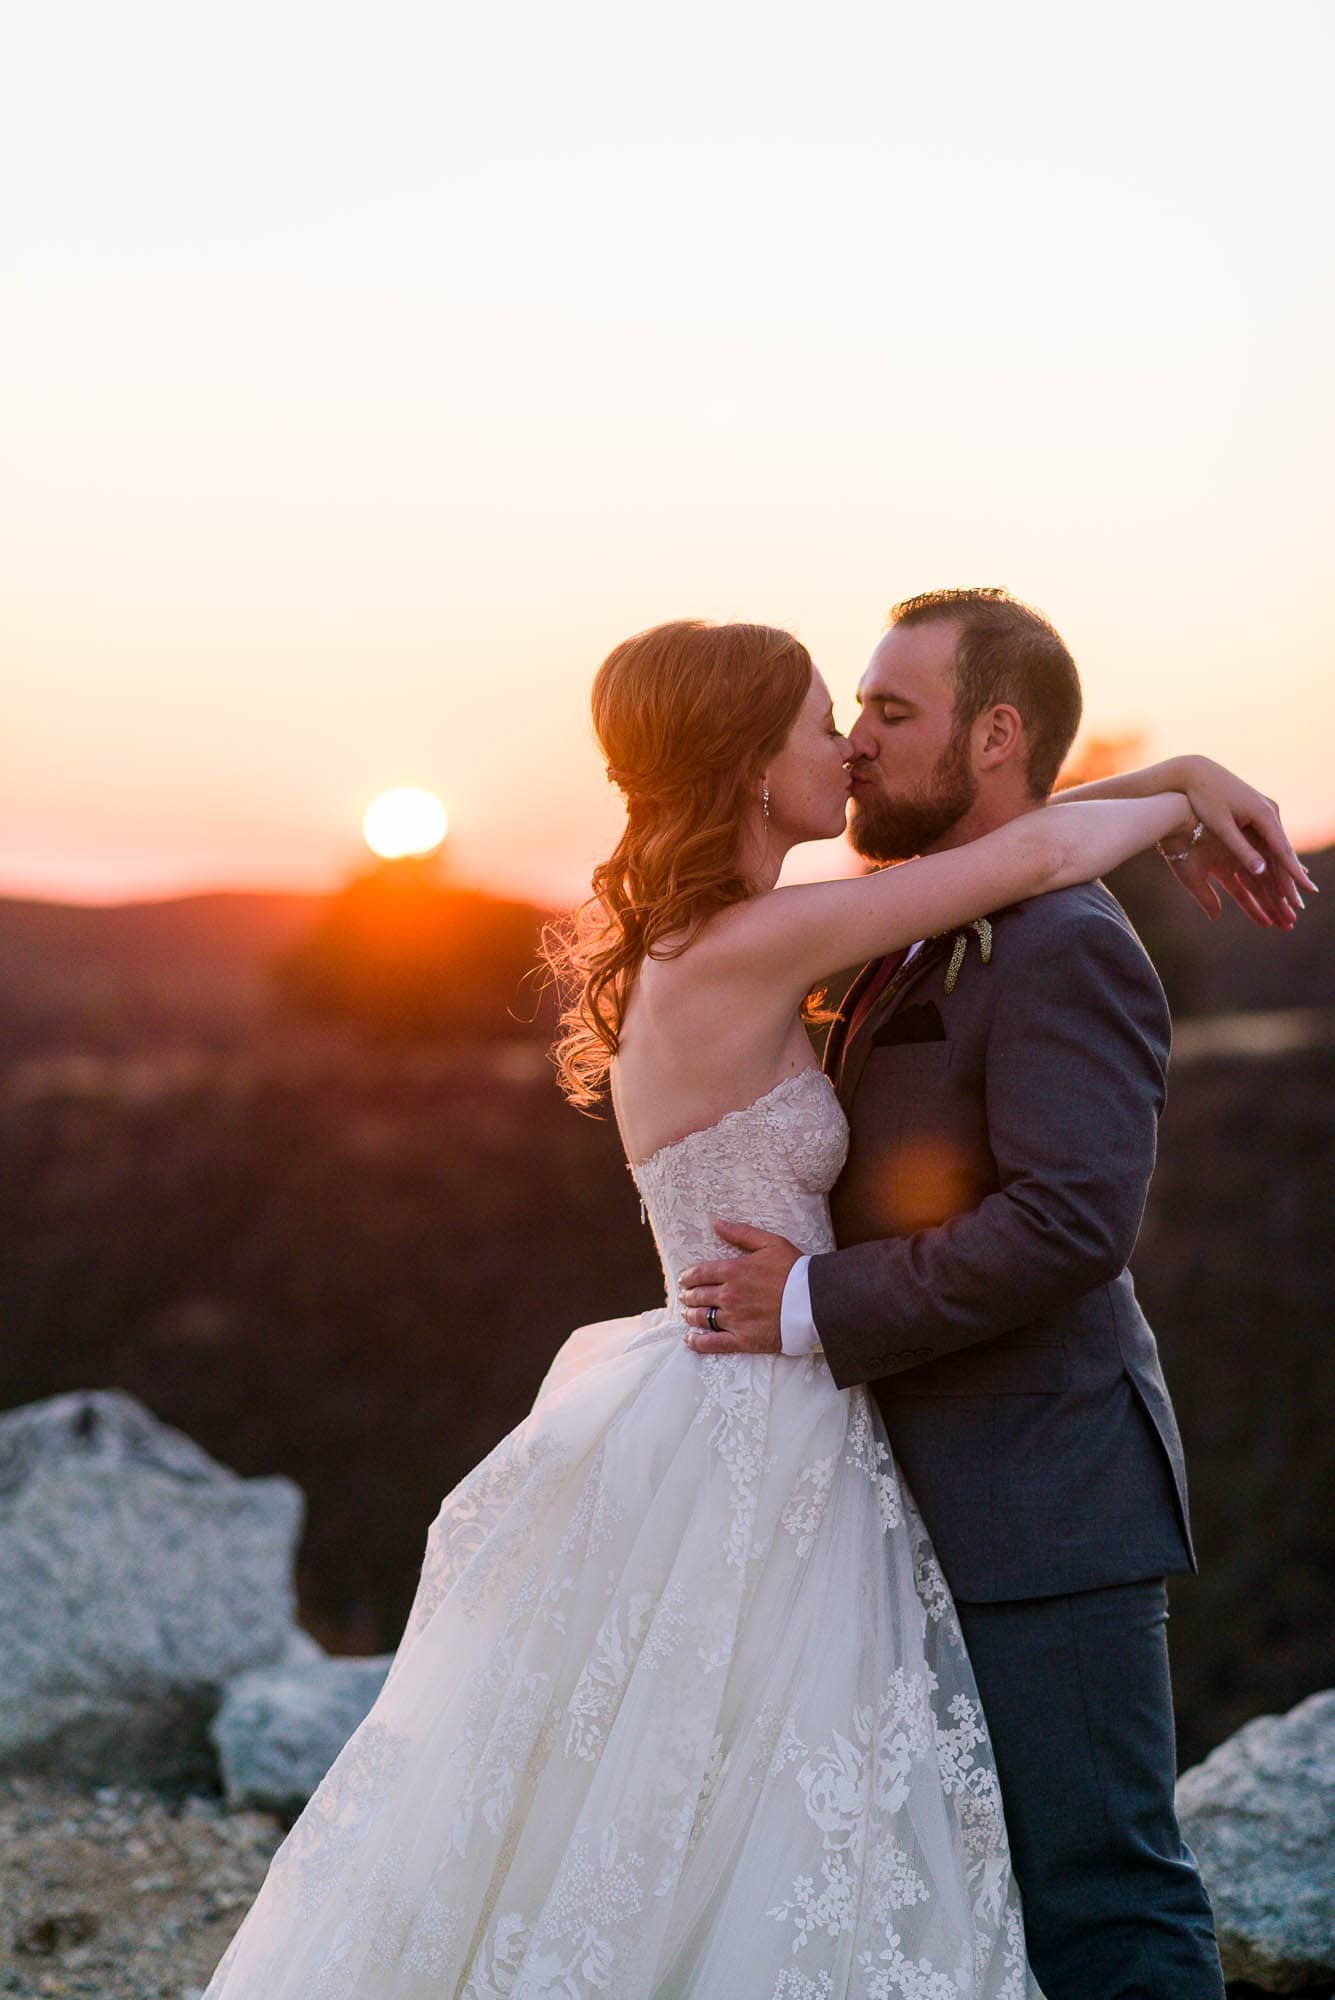 621_Alan_and_Heidi_Serendipity_Garden_Wedding_10-27-2018